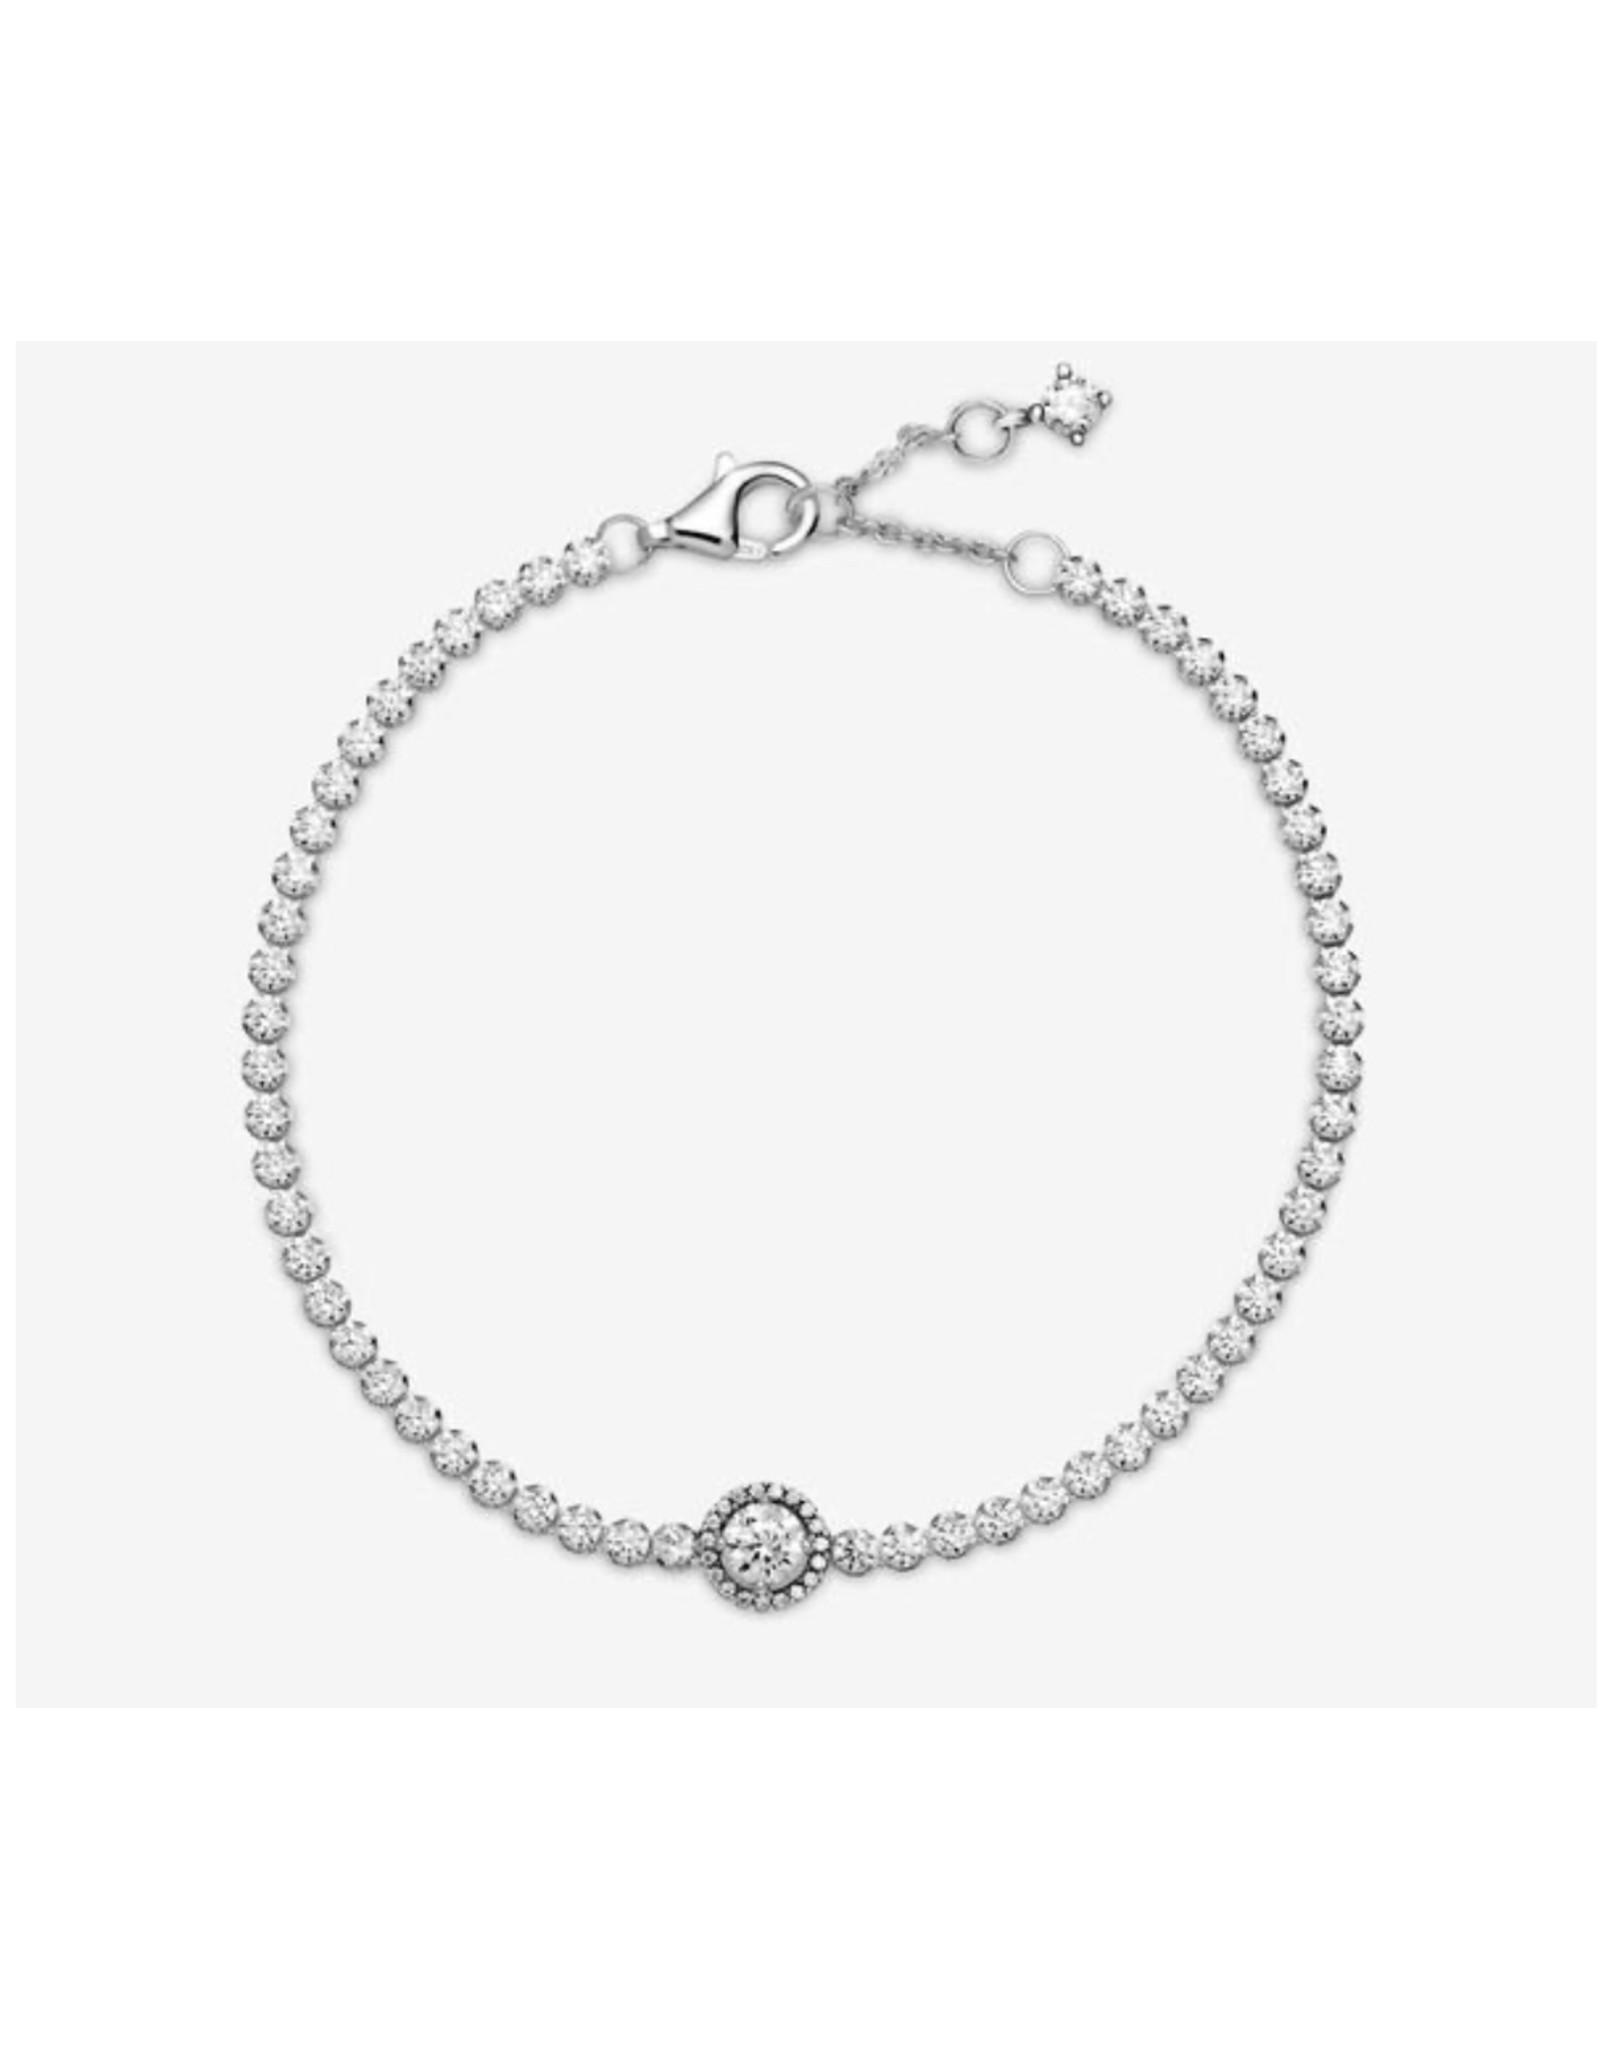 Pandora Pandora Bracelet,599416C01, Sparkling Halo Tennis Bracelet, Clear CZ